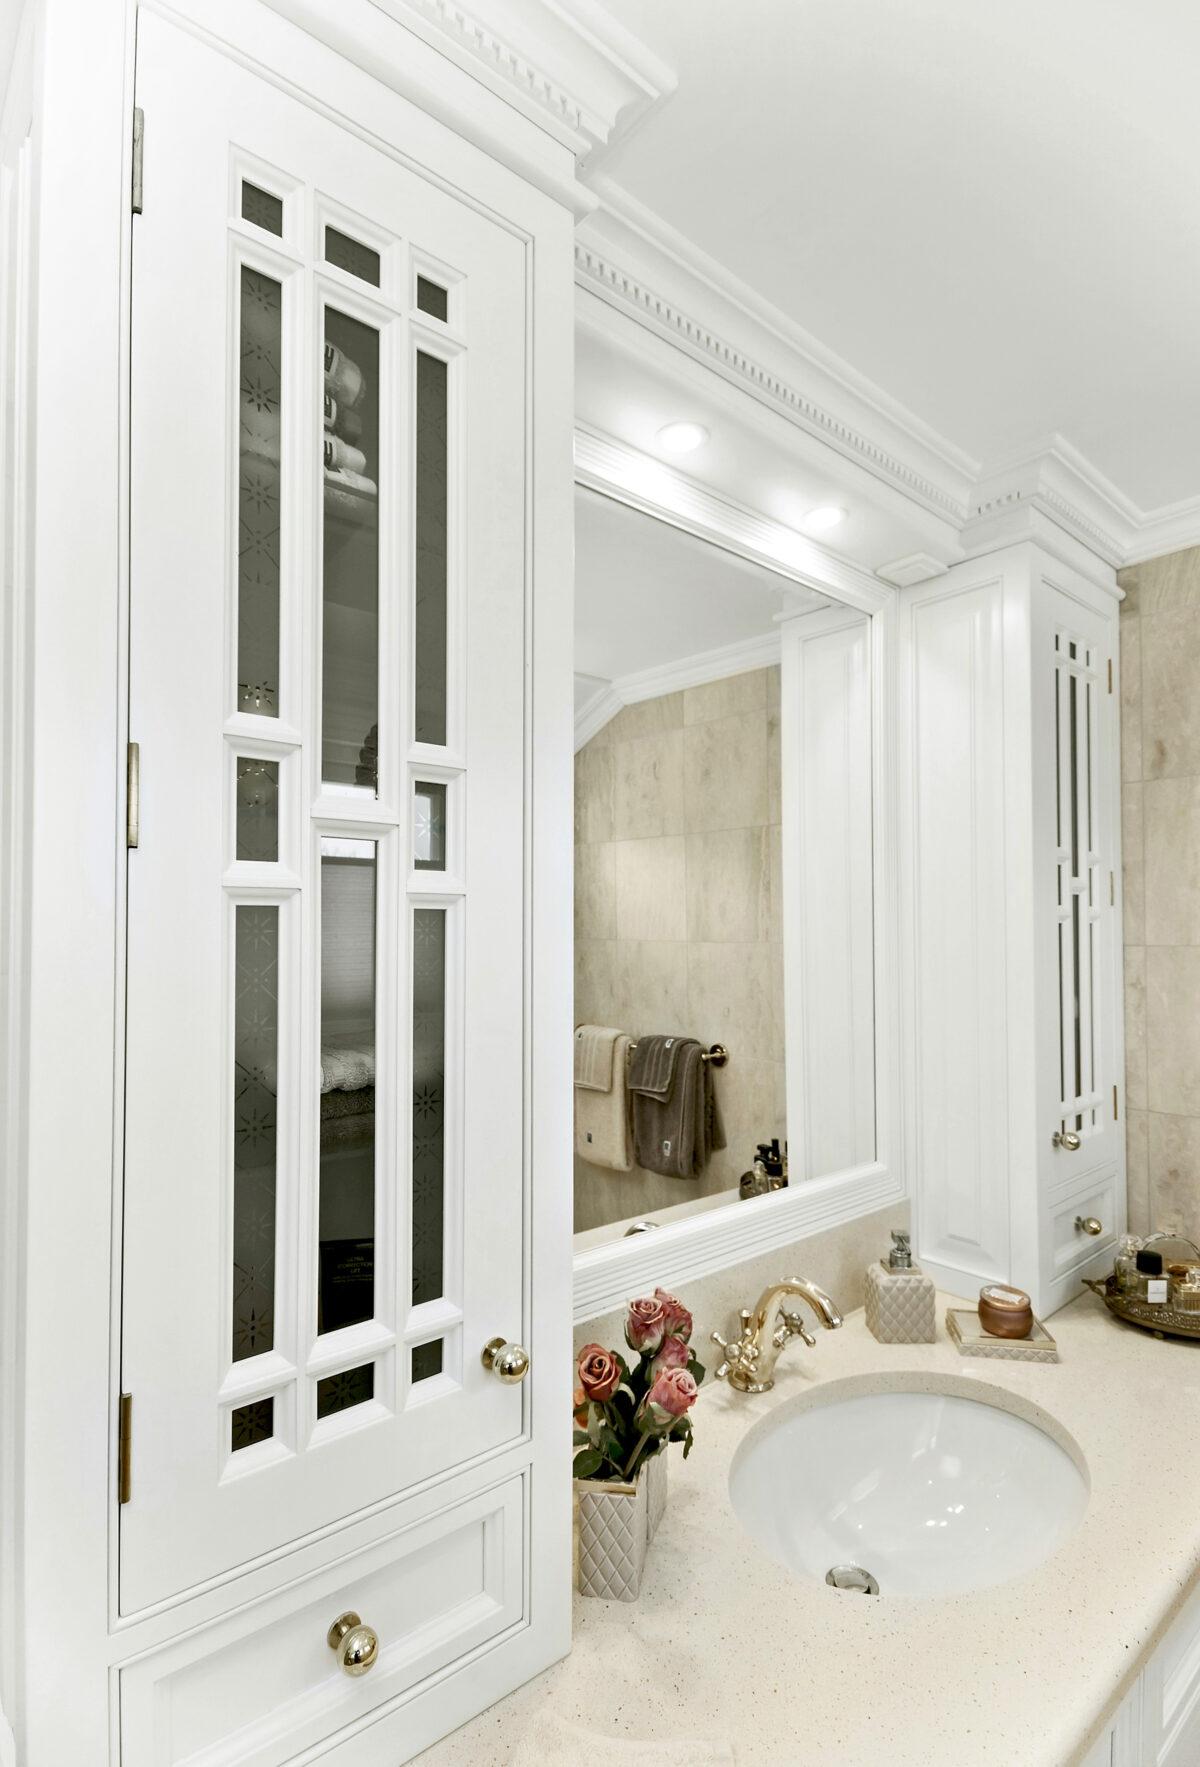 Klassisk badinnredning